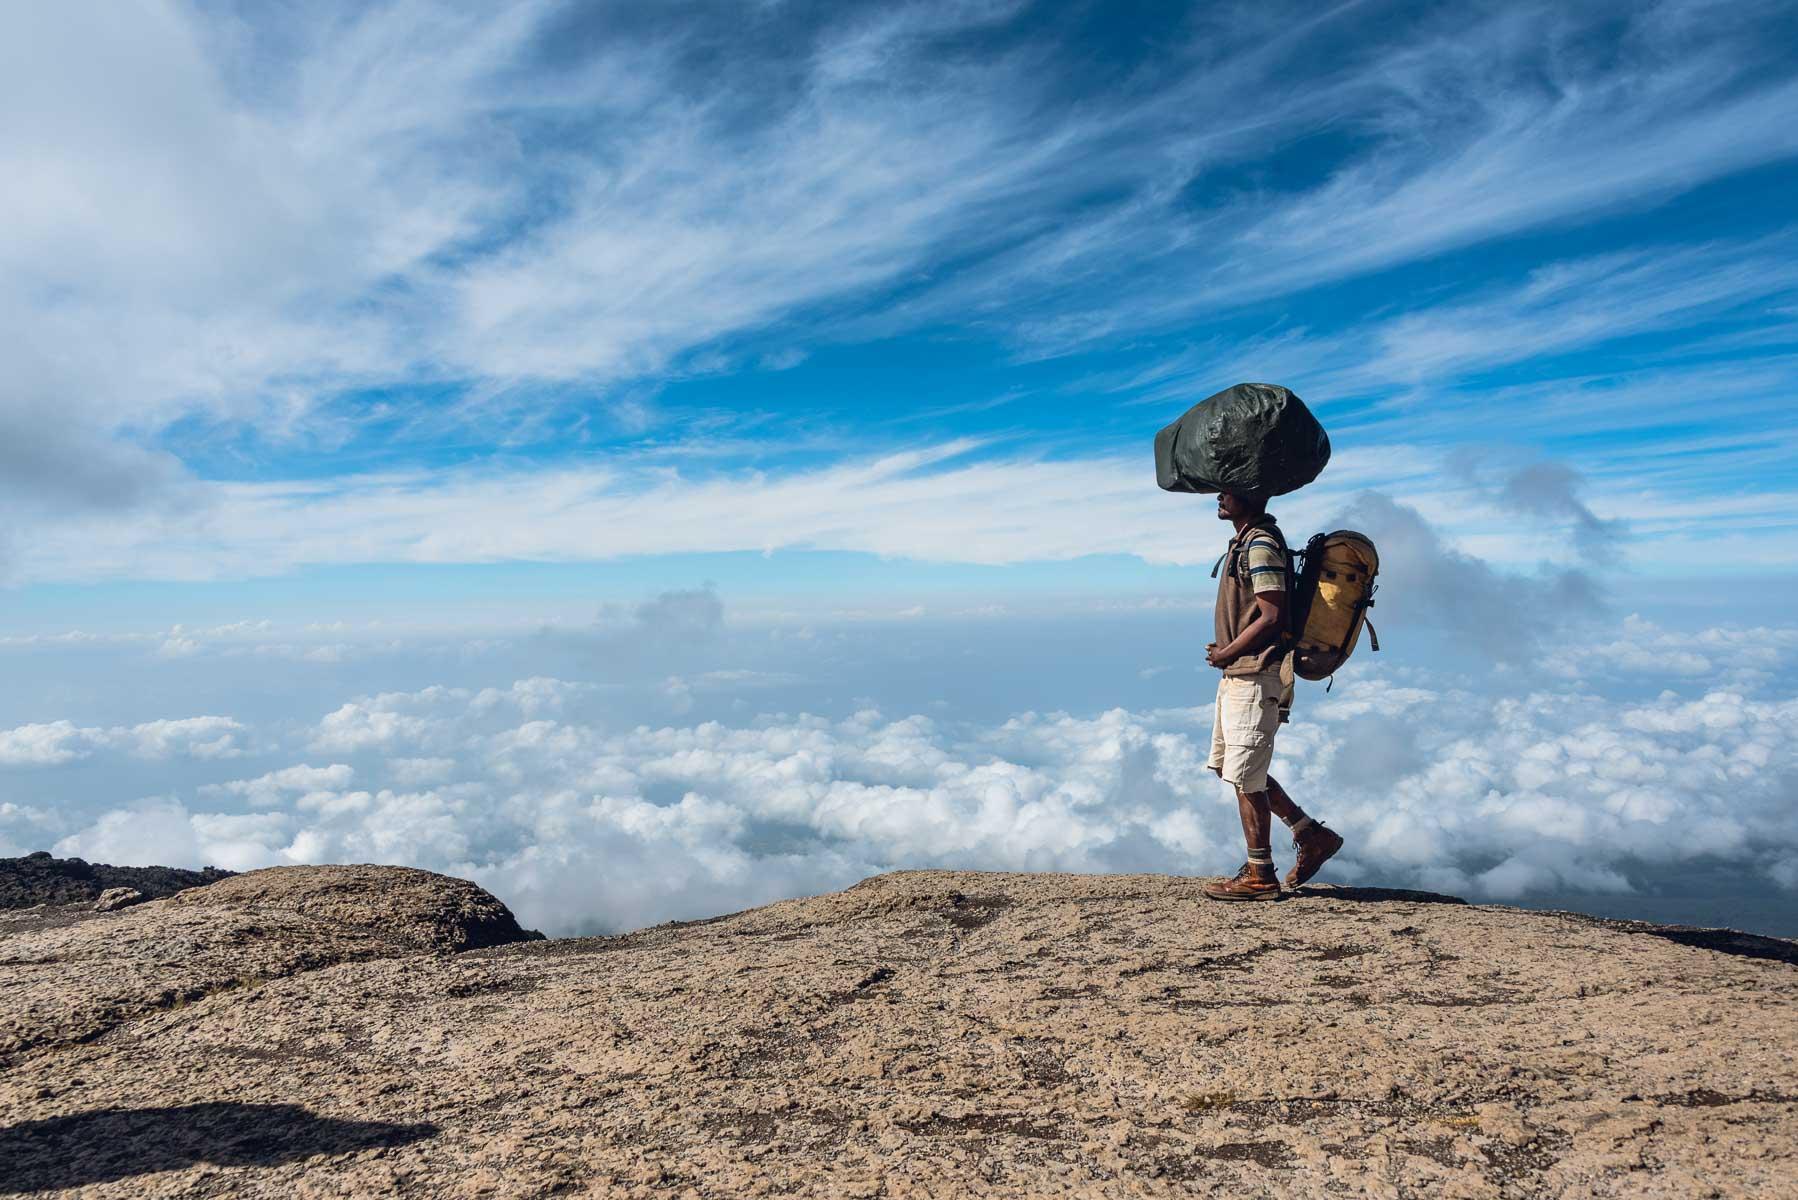 Christian Meixner Fotografie, Fotograf Zürich, Kilimanjaro, Tanzania, Porter, Reisen, Reisefotografie